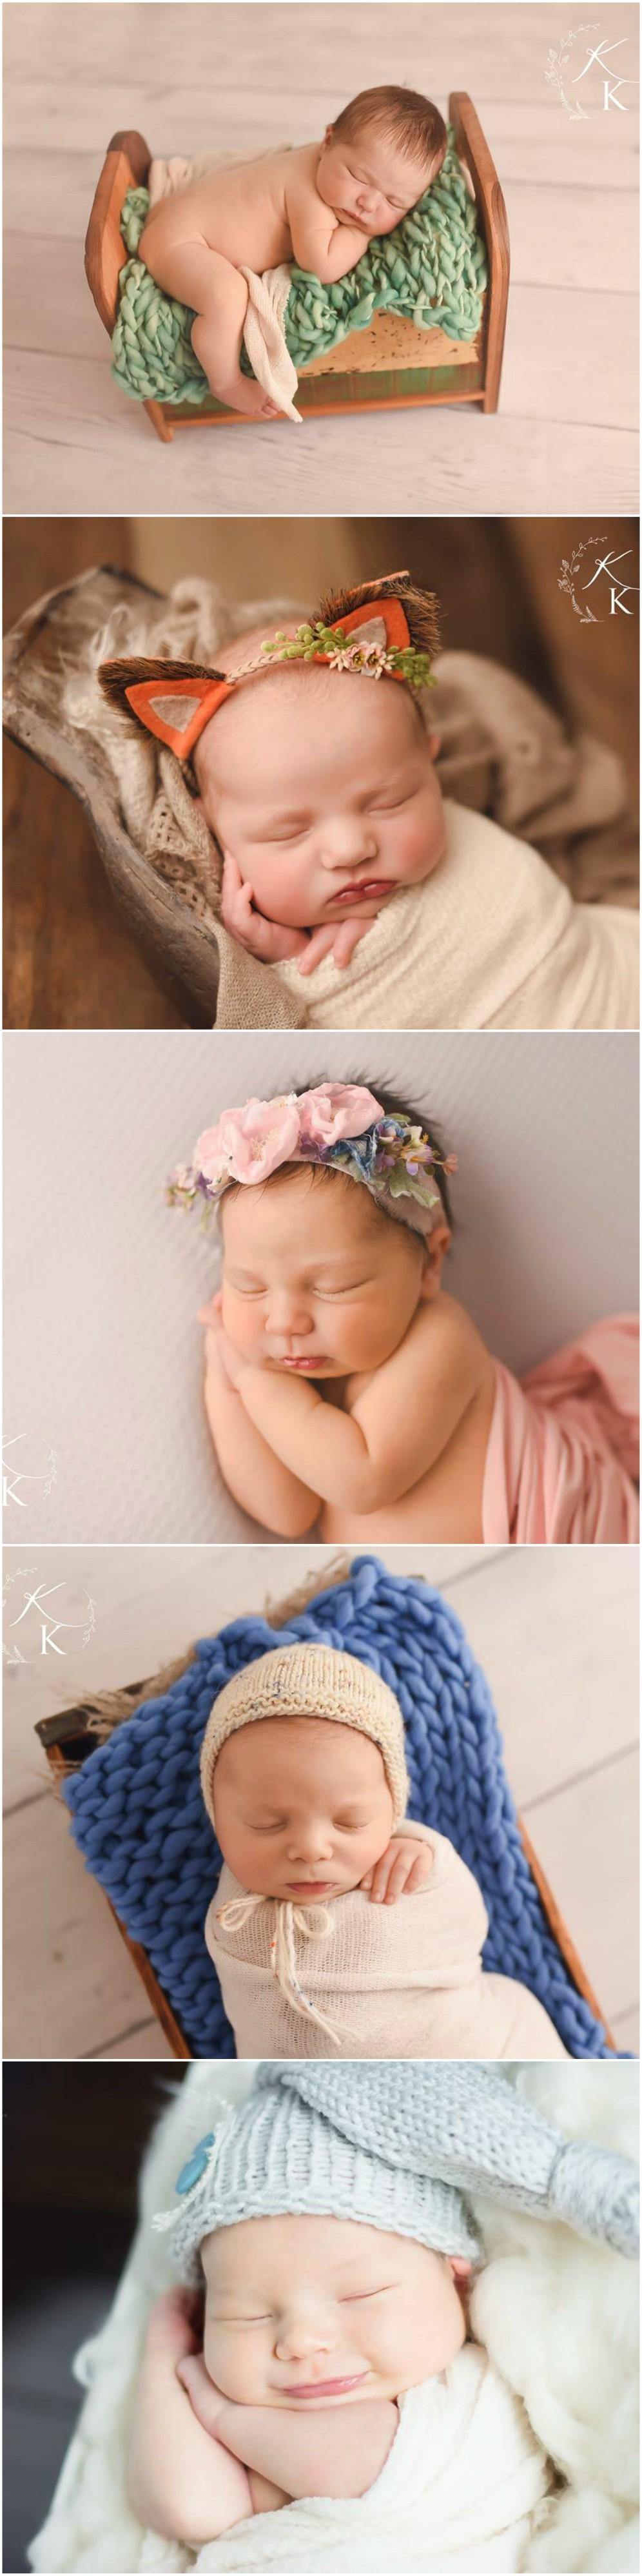 Kelly kristine photography newborn photography baby girl baby boy https www